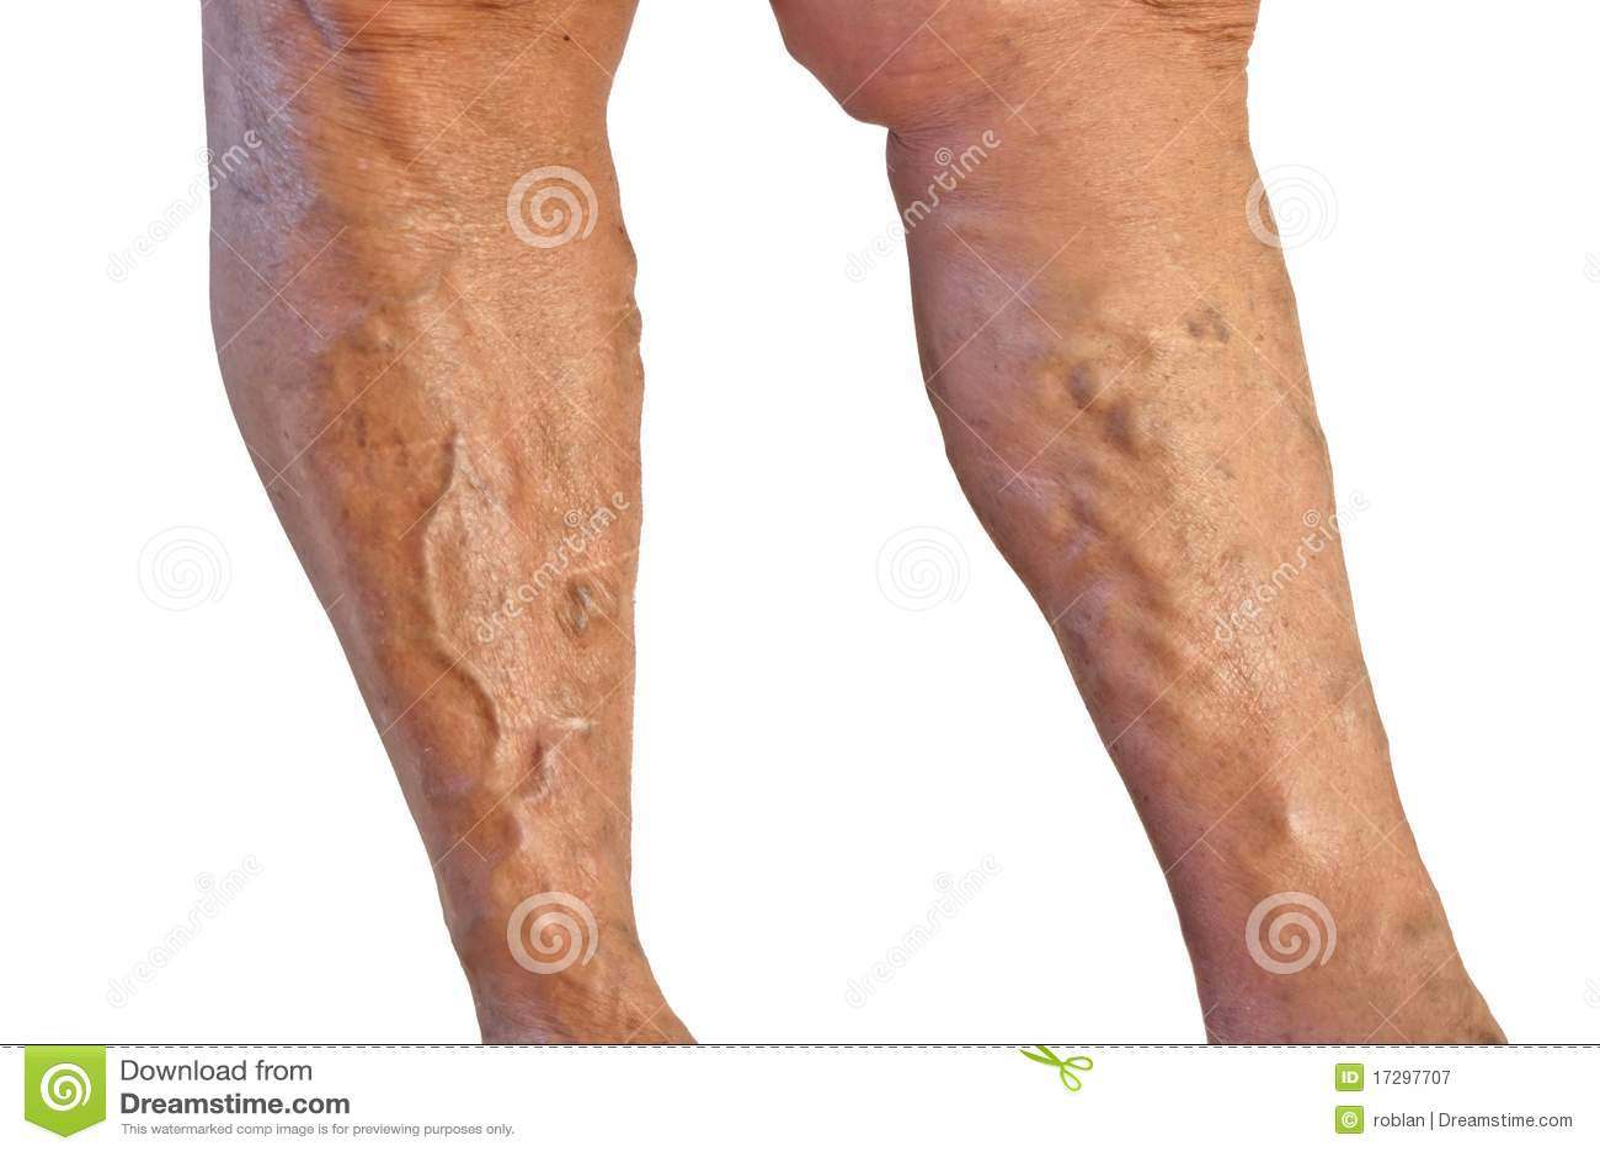 Venotonik a trombosi di vene profonde